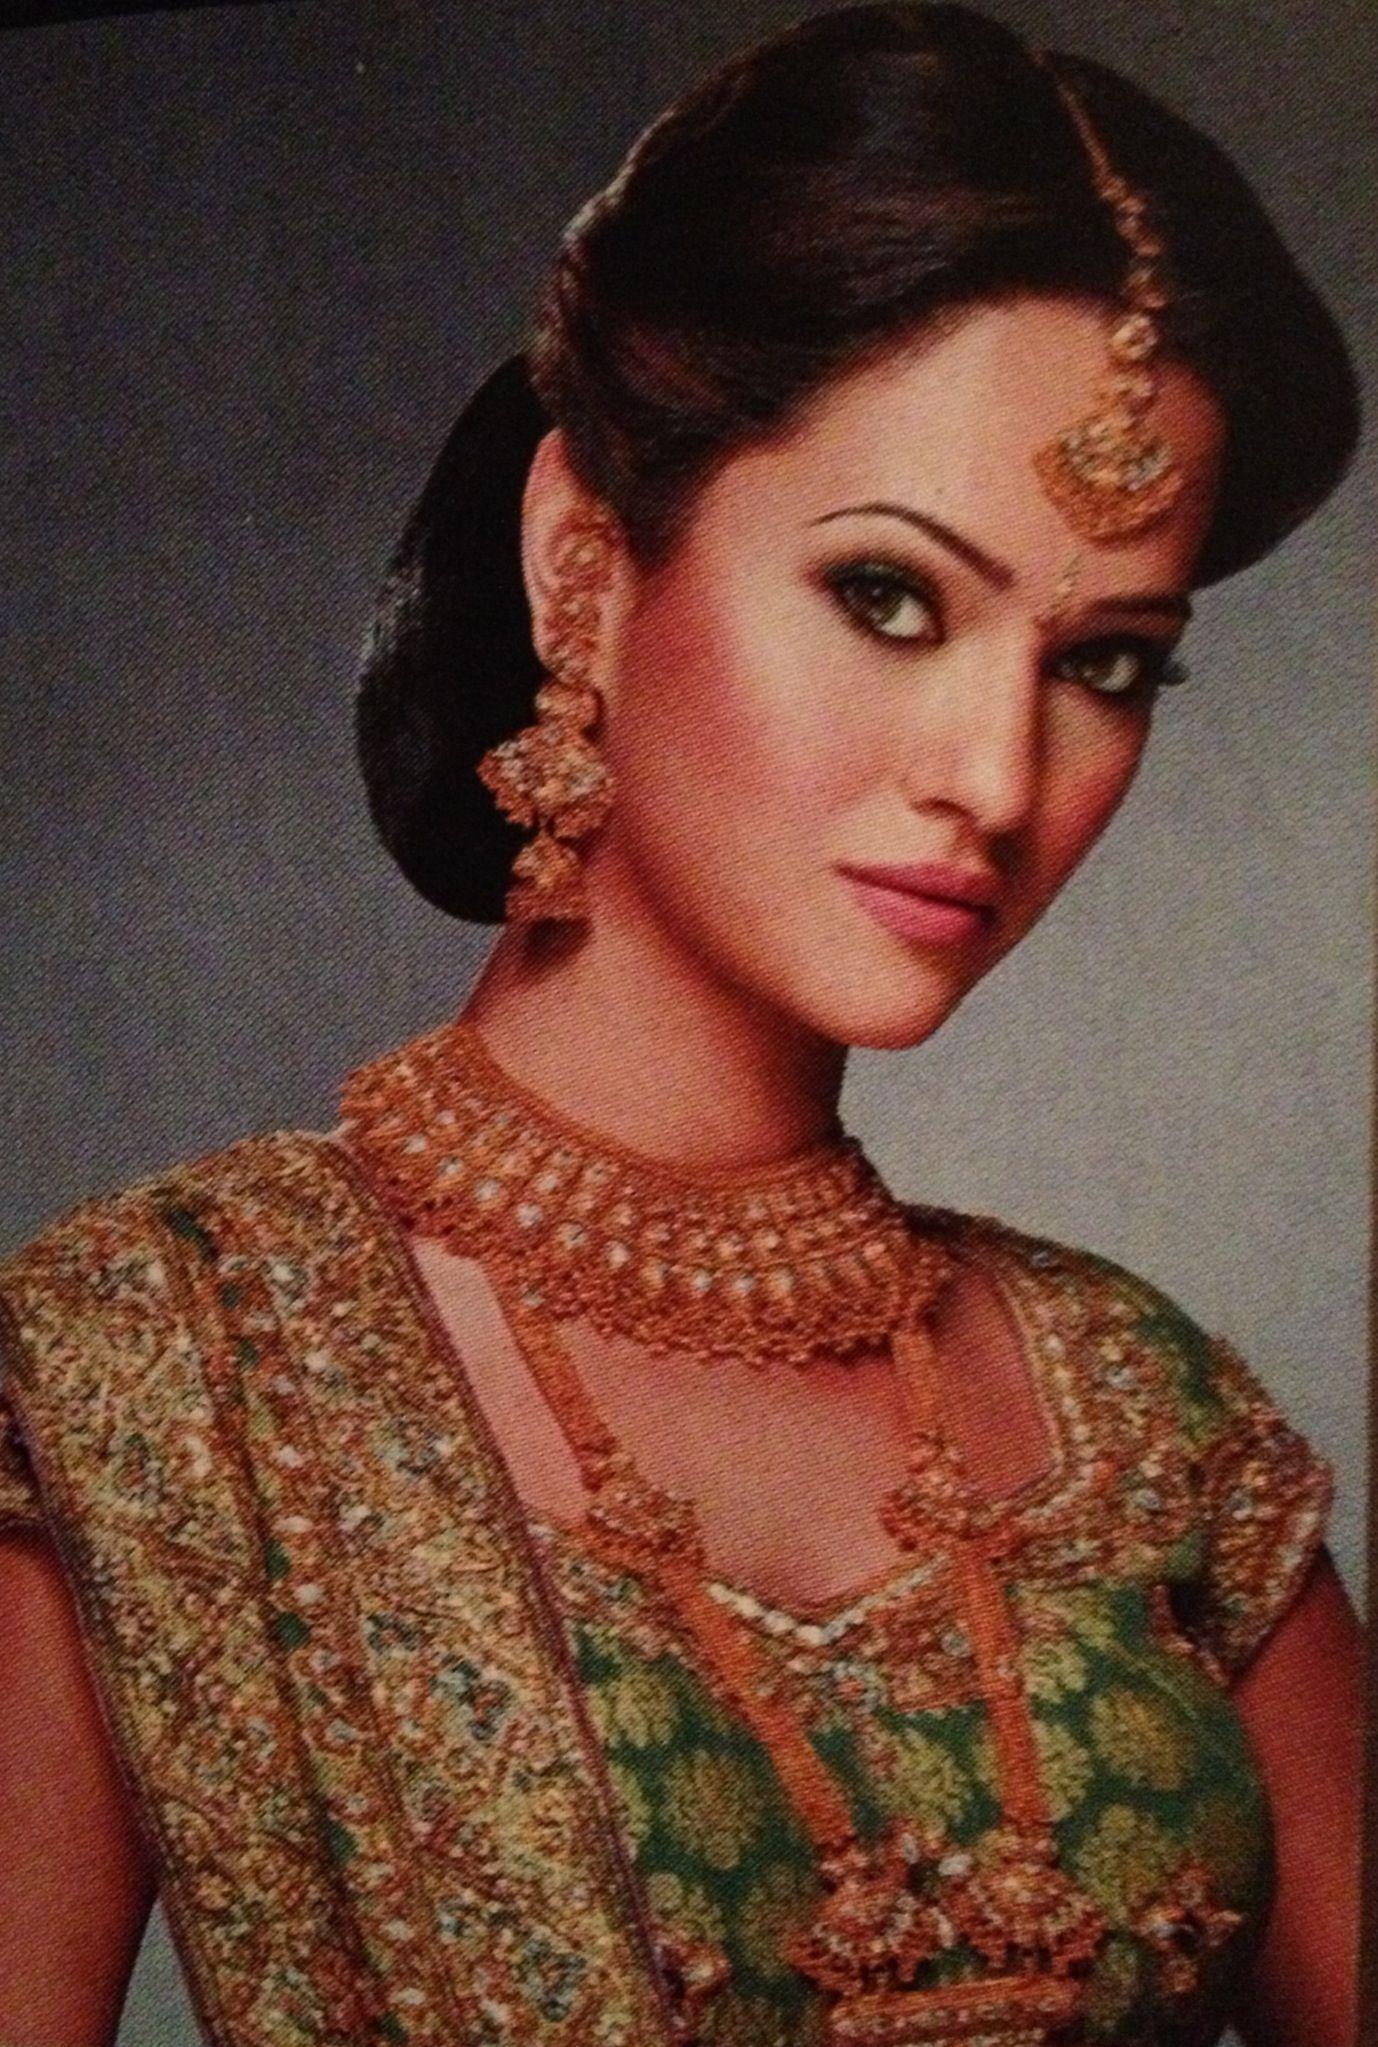 Traditional Bridal Makeup Images : Traditional Indian bridal makeup Wedding hair Pinterest